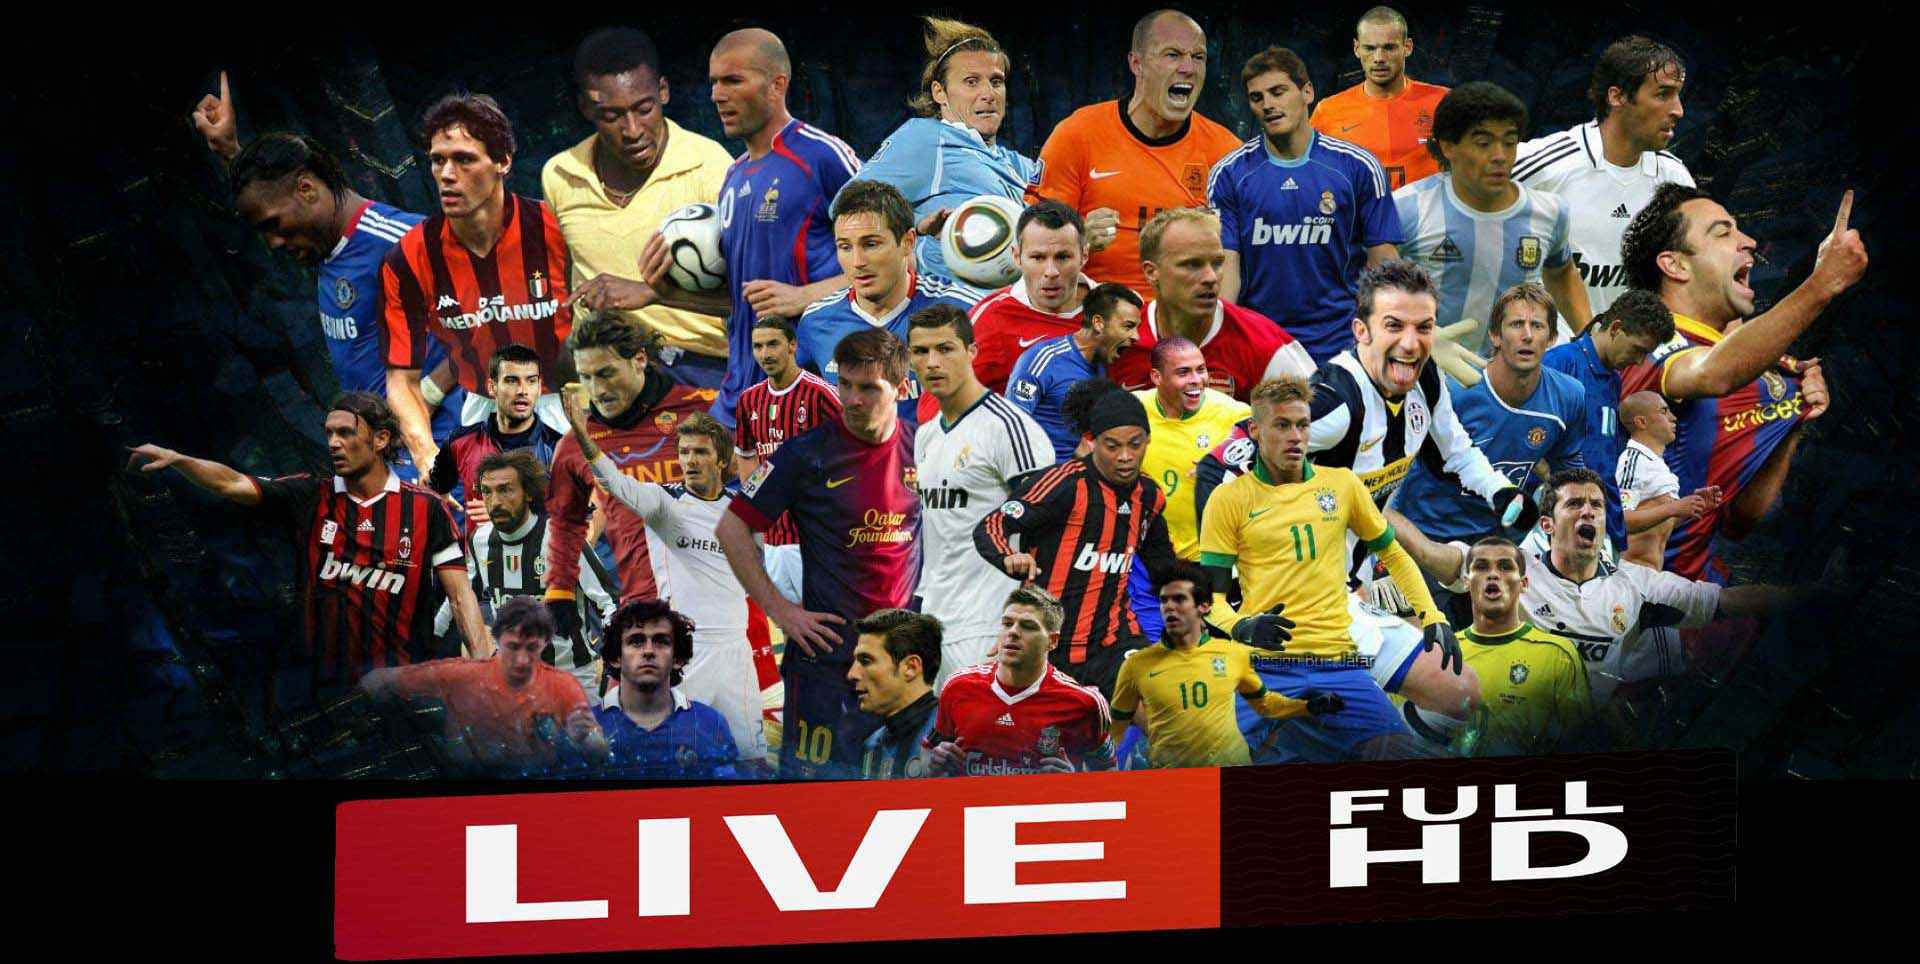 porto-vs-club-brugge-uefa-online-live